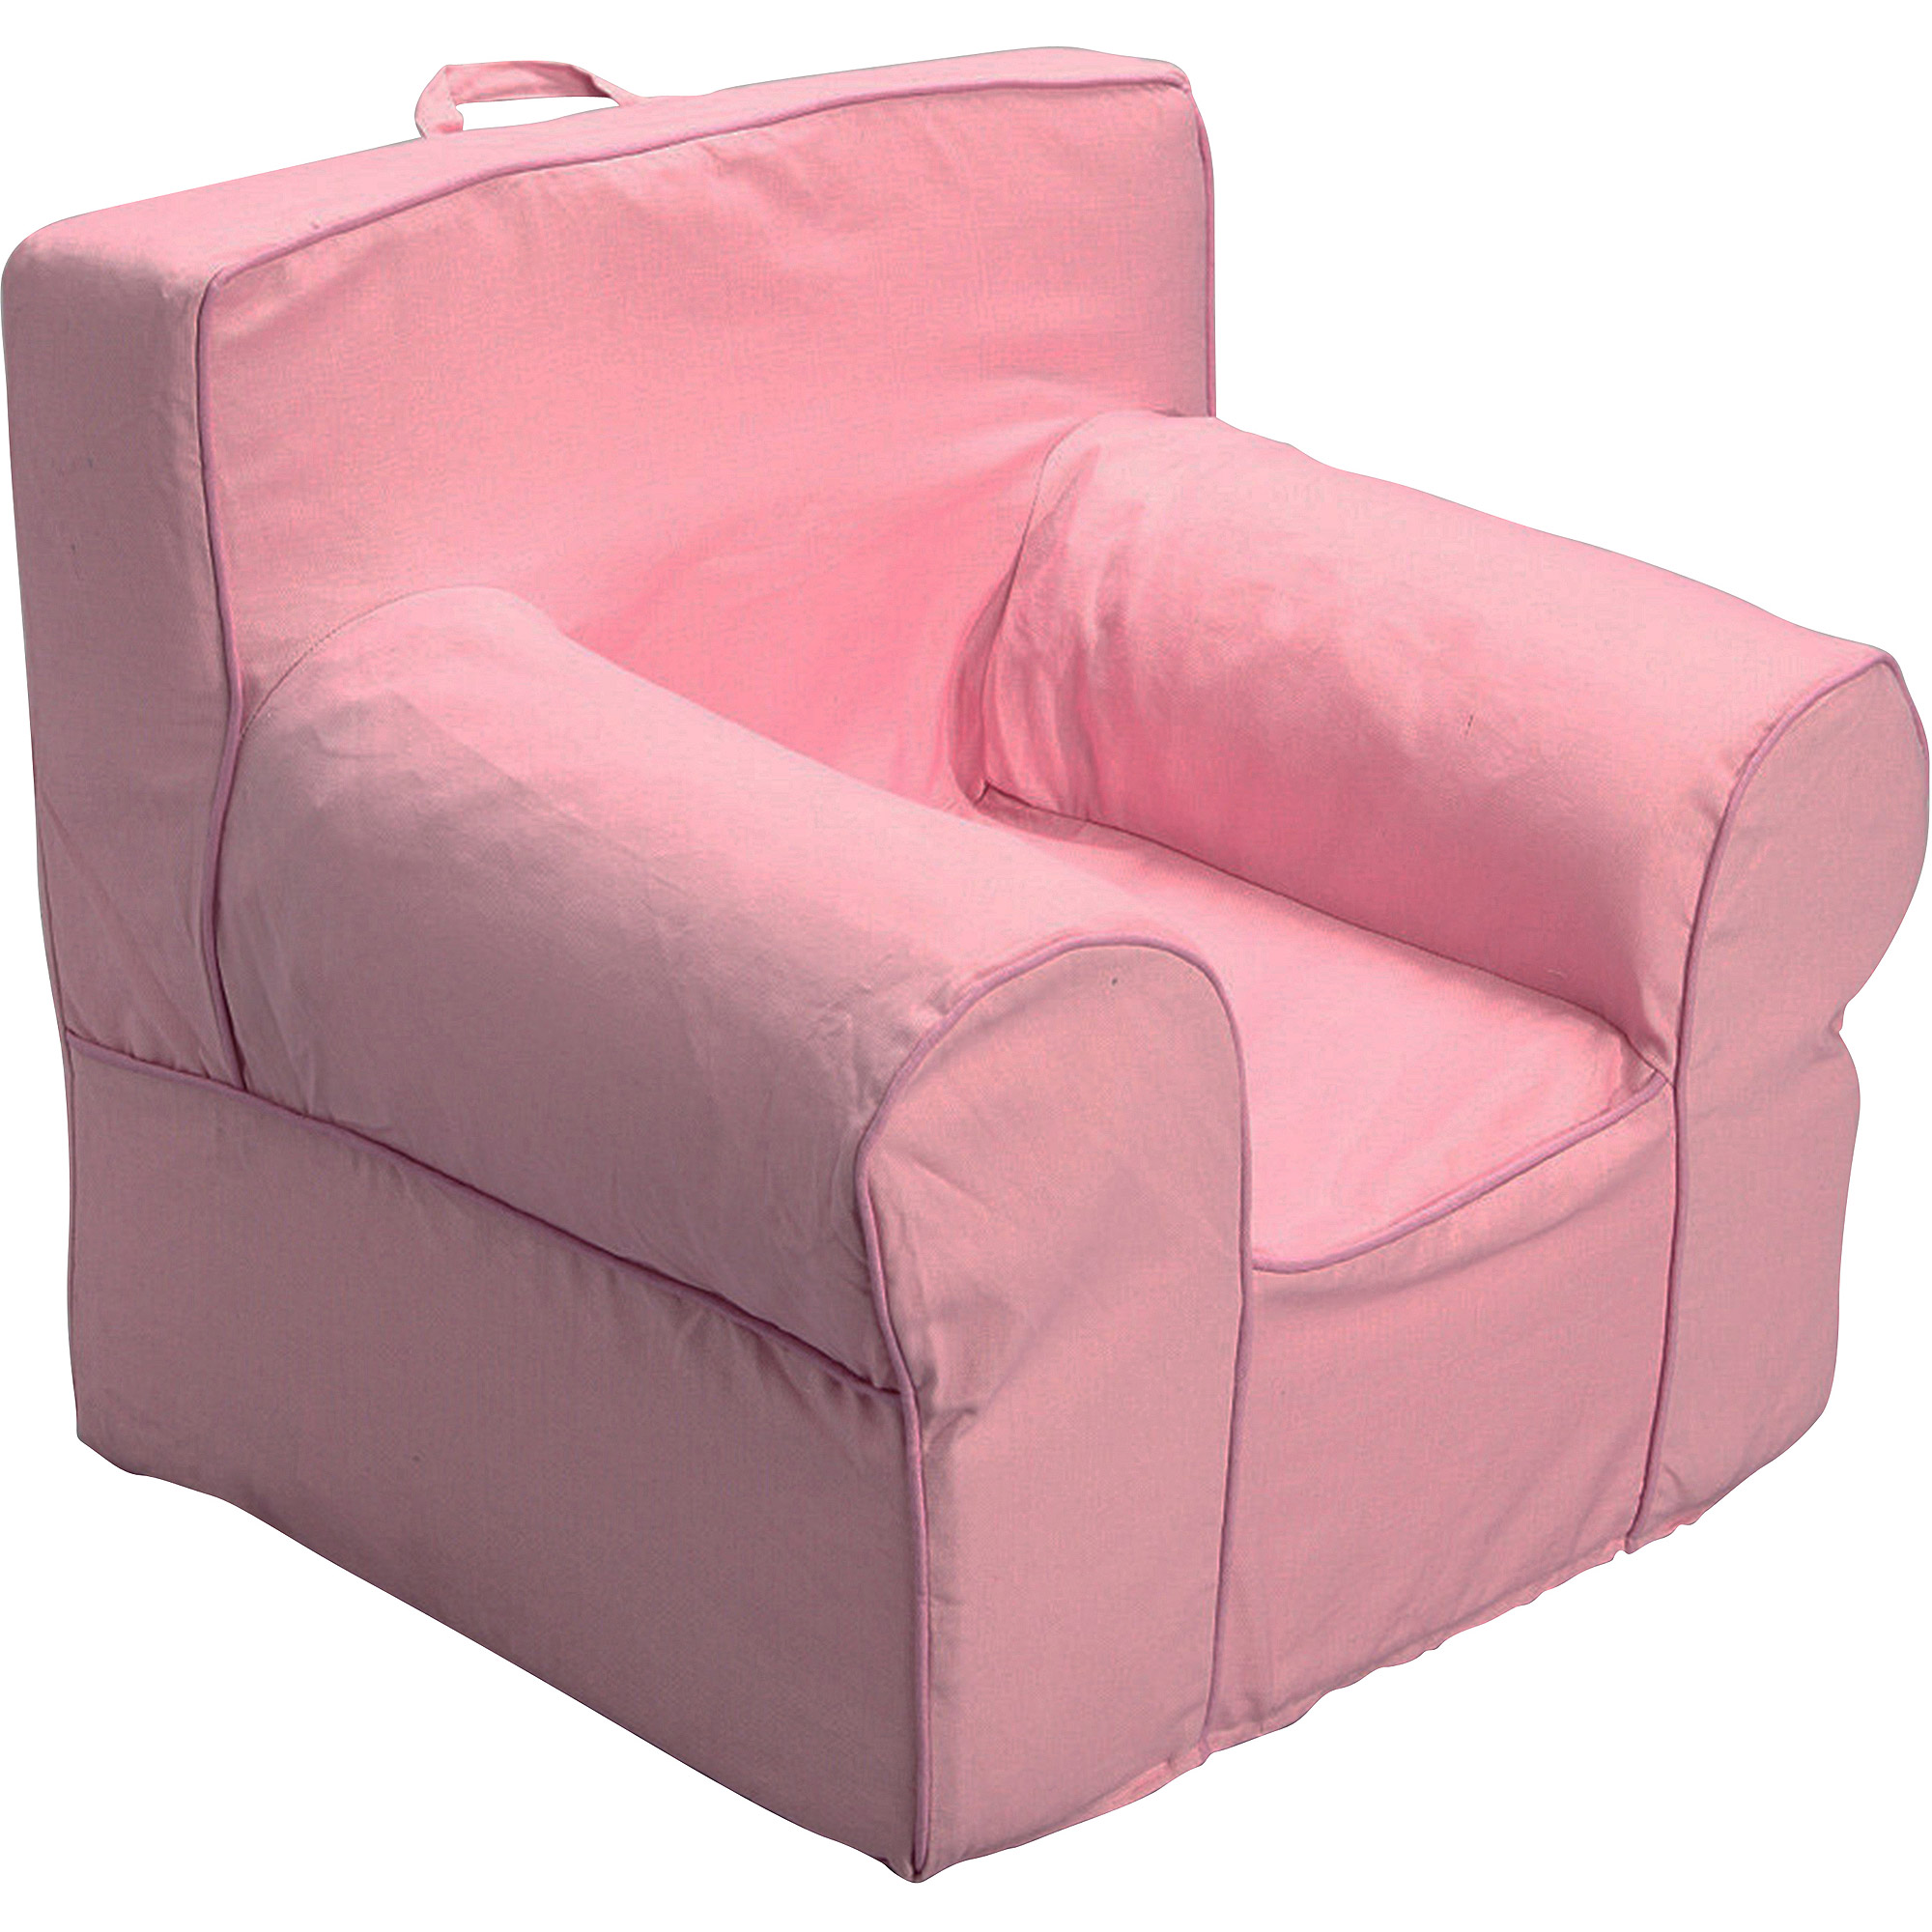 medium pink foam chair slip cover plus i walmart com